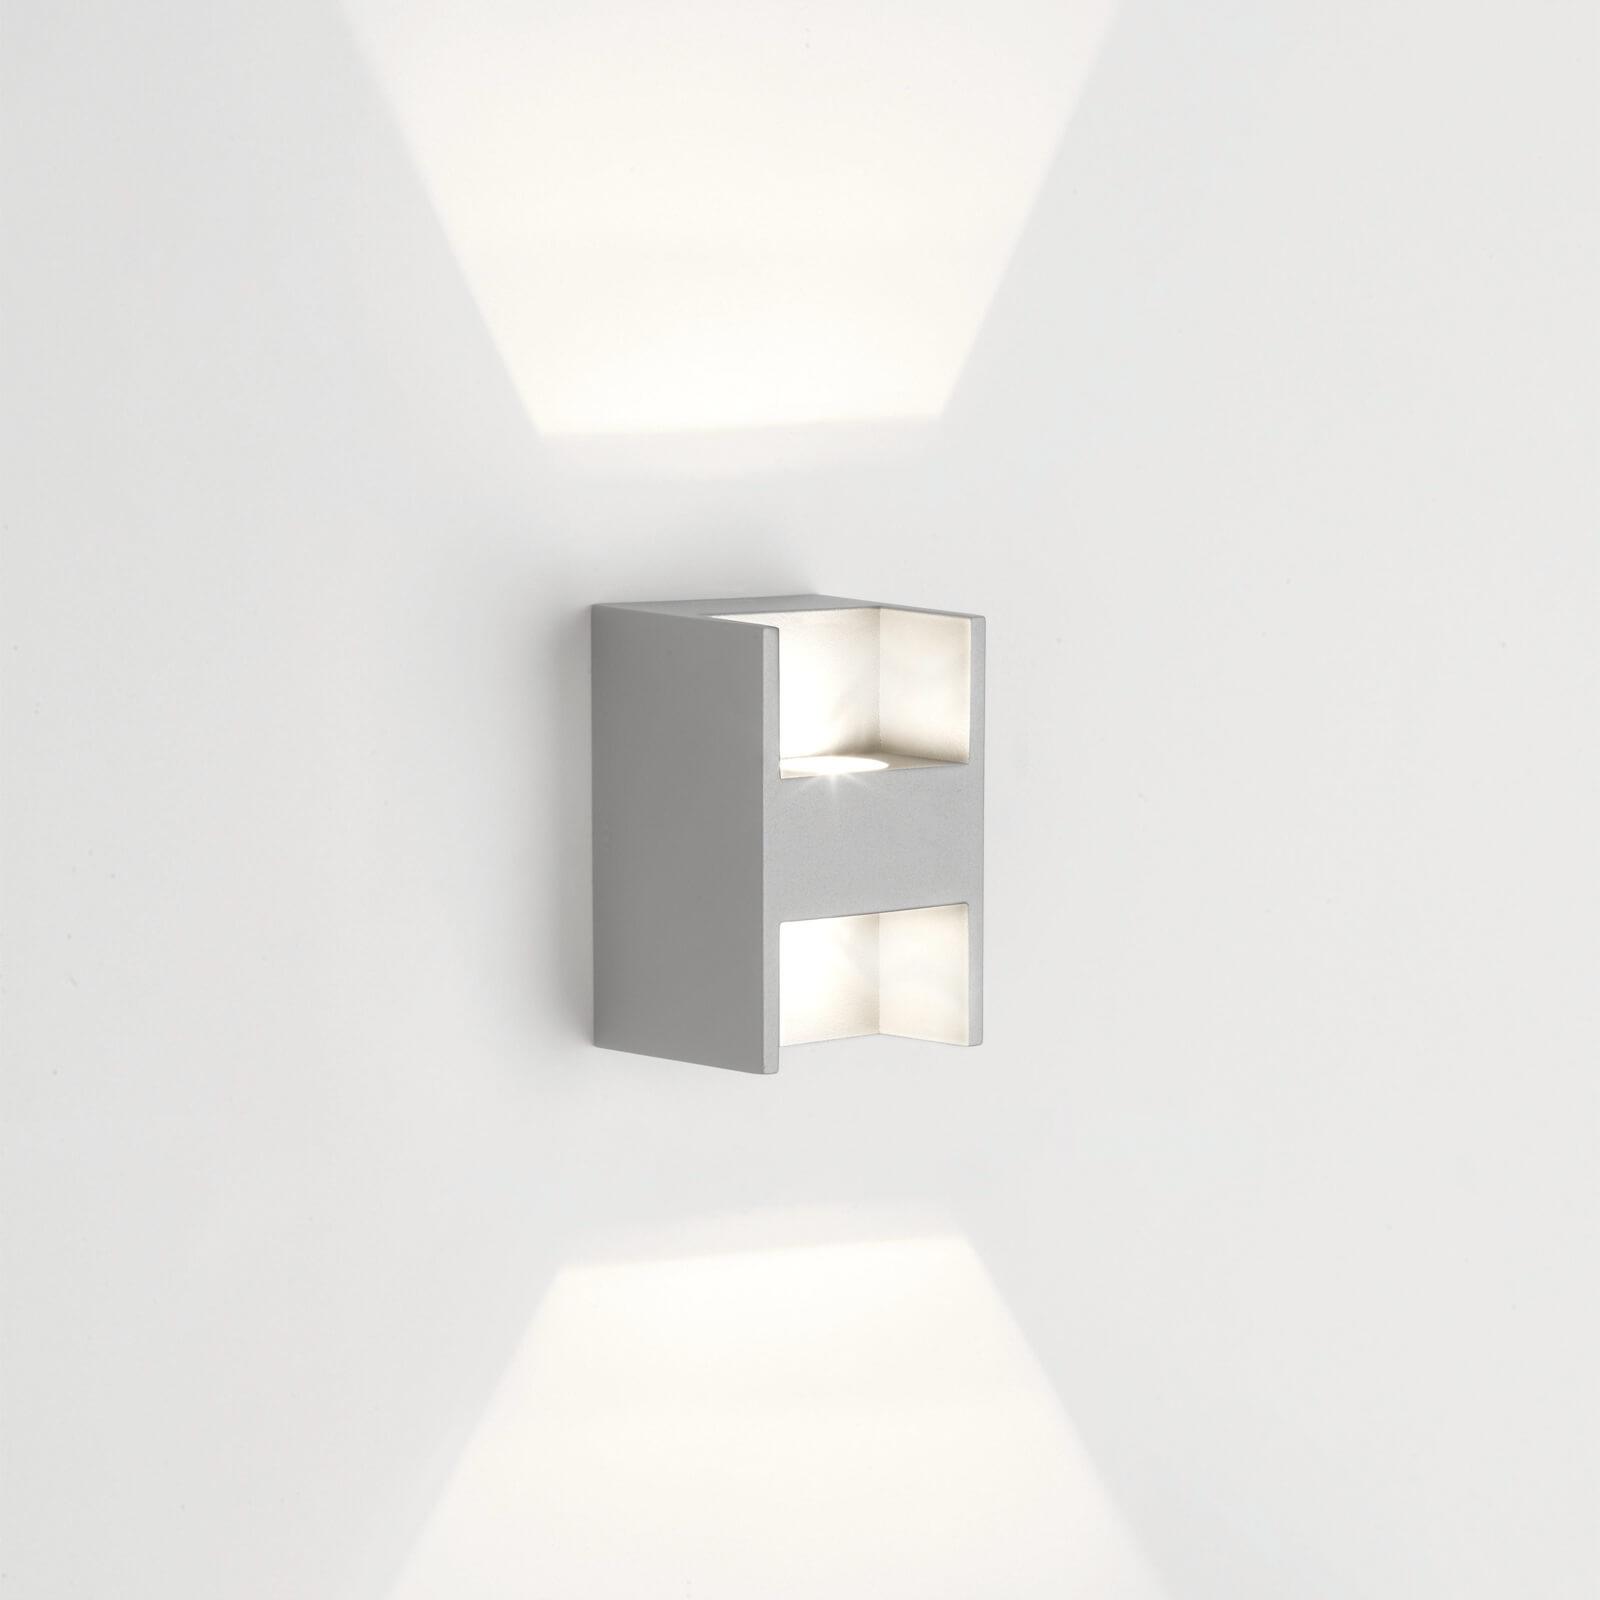 Philips ledino metric wandlamp grijs 2 lampen for Lampen philips